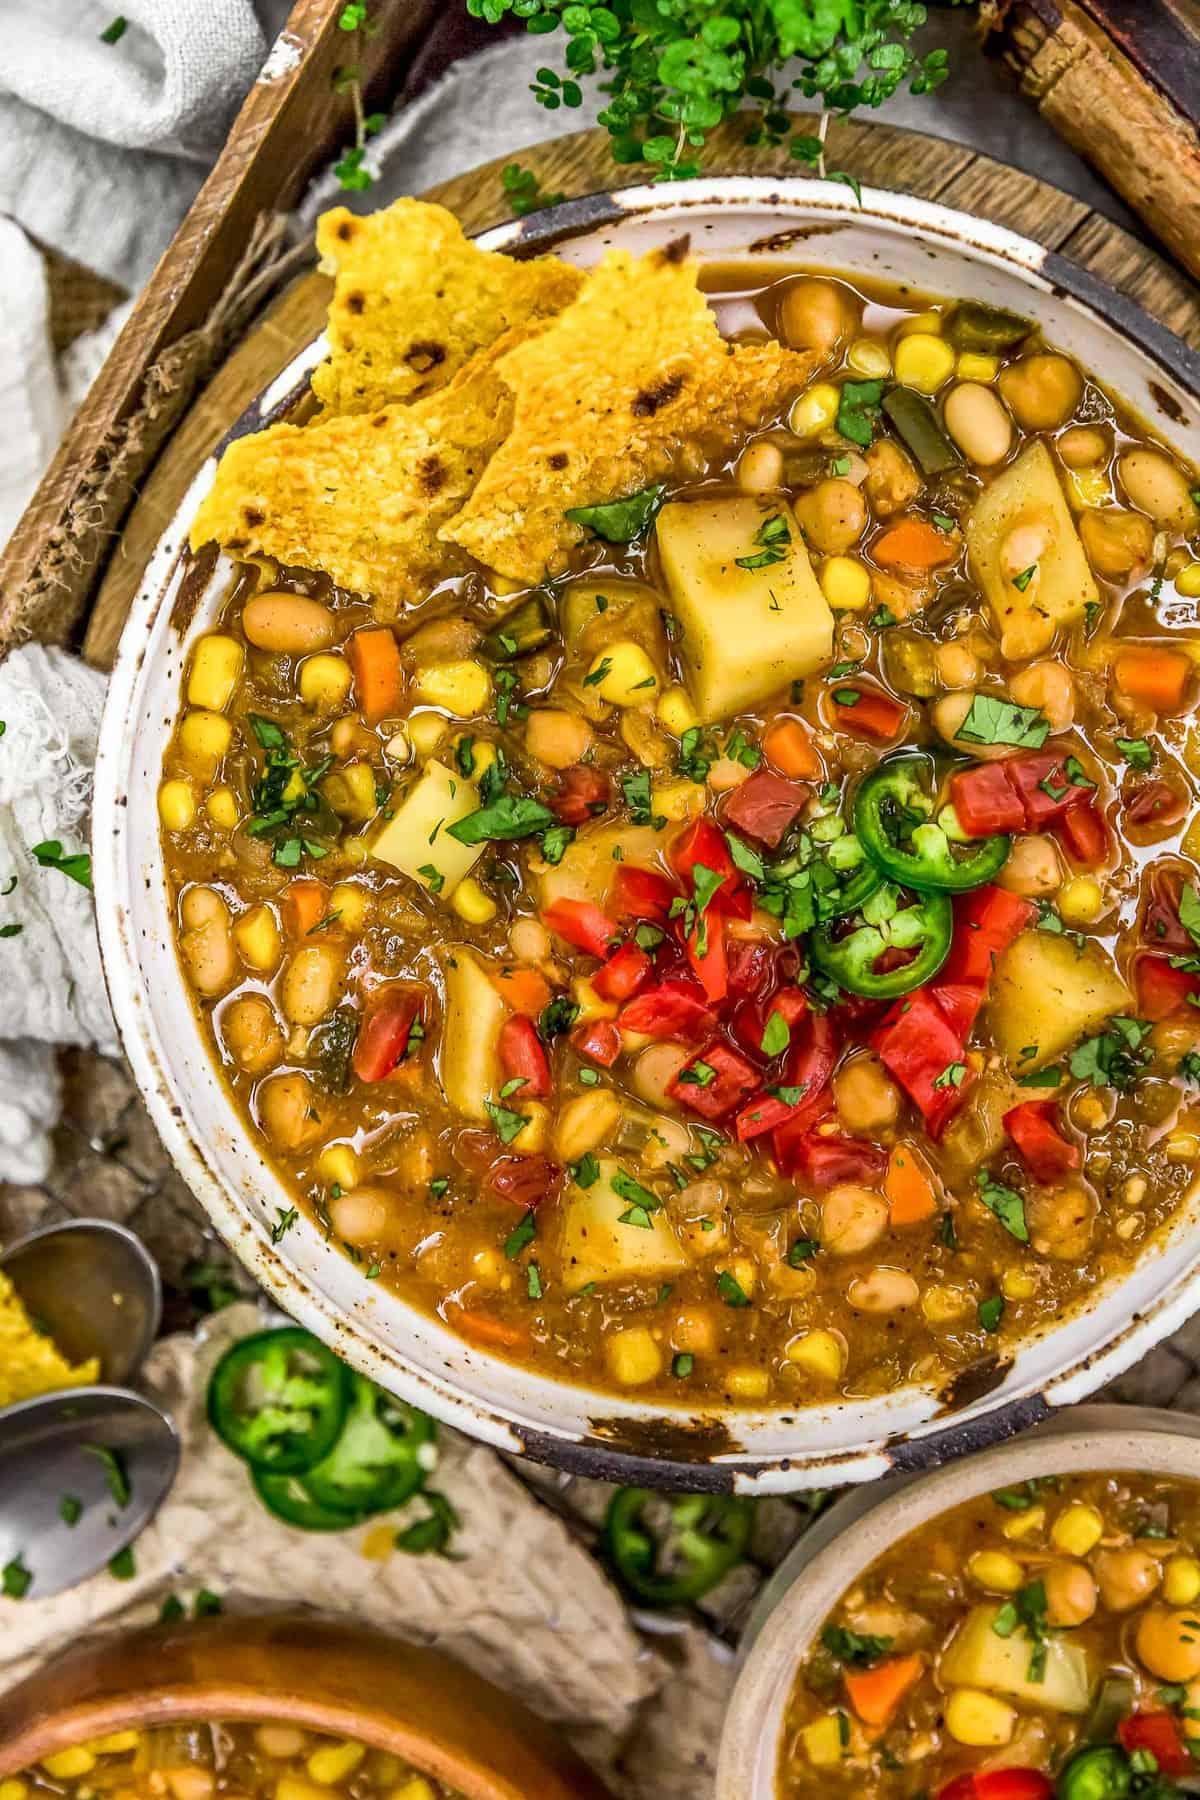 Bowl of White Bean Potato Chili